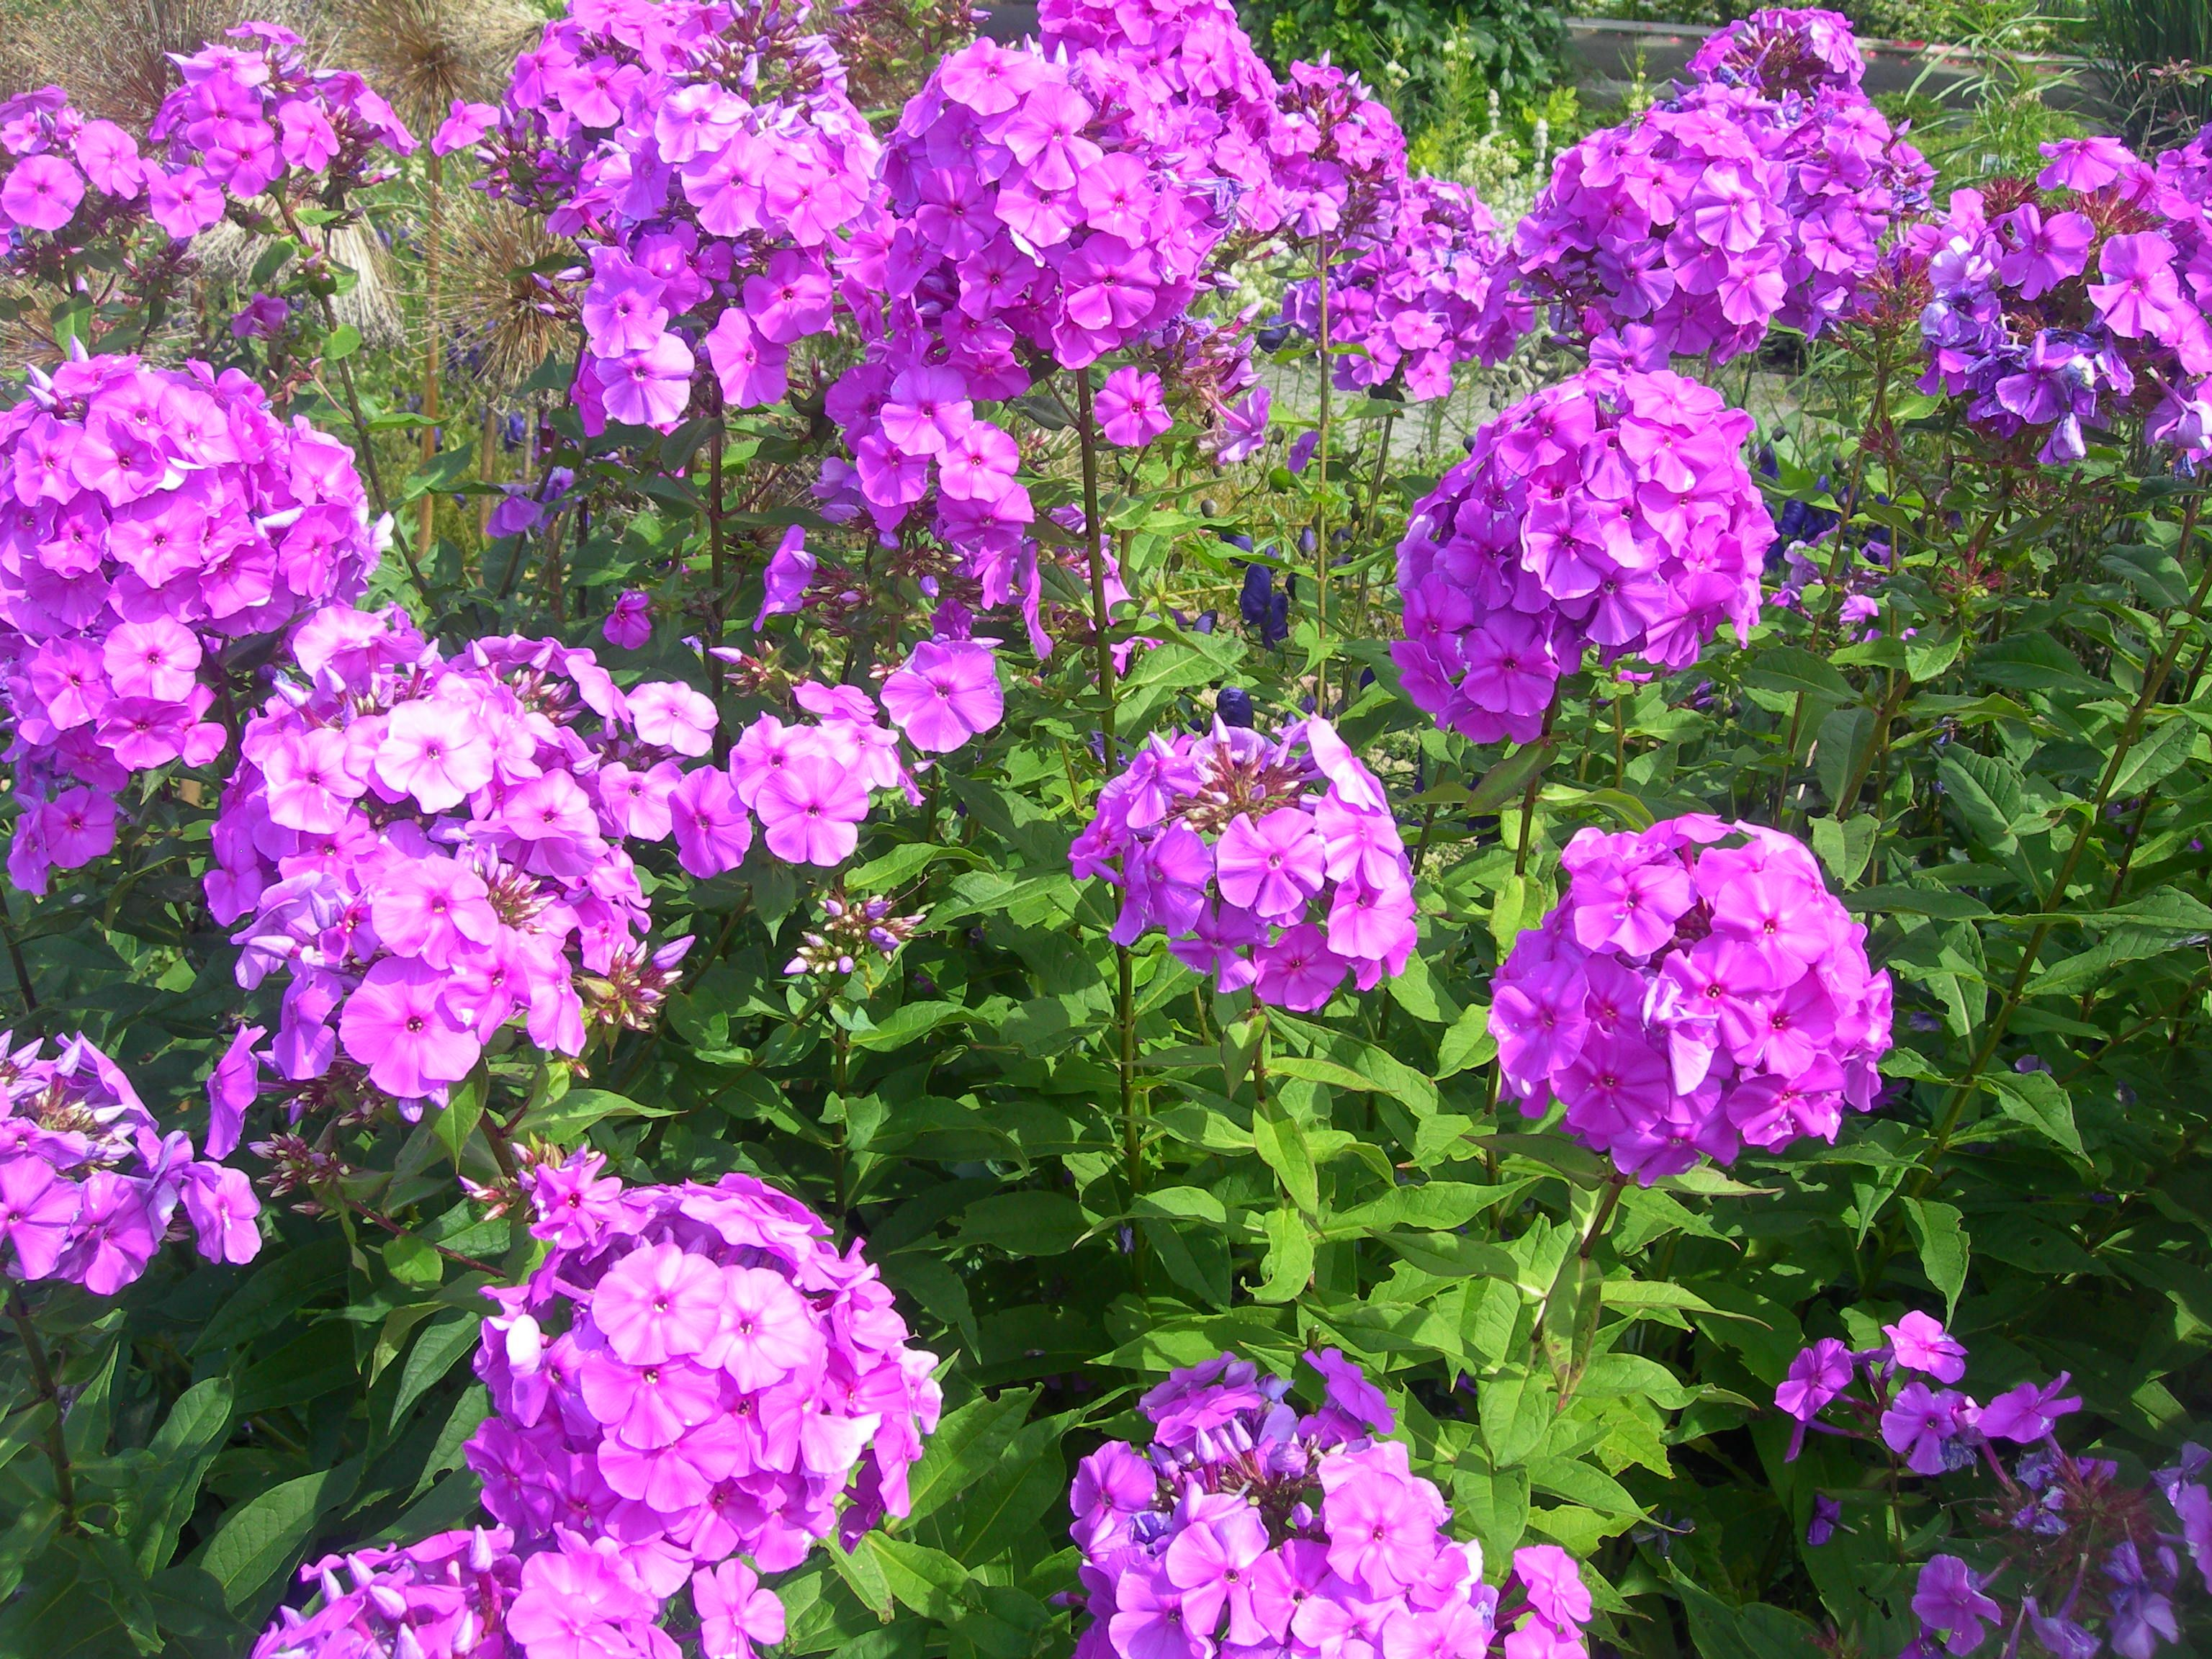 Garden Phlox Plant   Make Sure To Visit GardenAnswers.com And Download Our  Free Plant · Phlox FlowersLove FlowersSummer ...